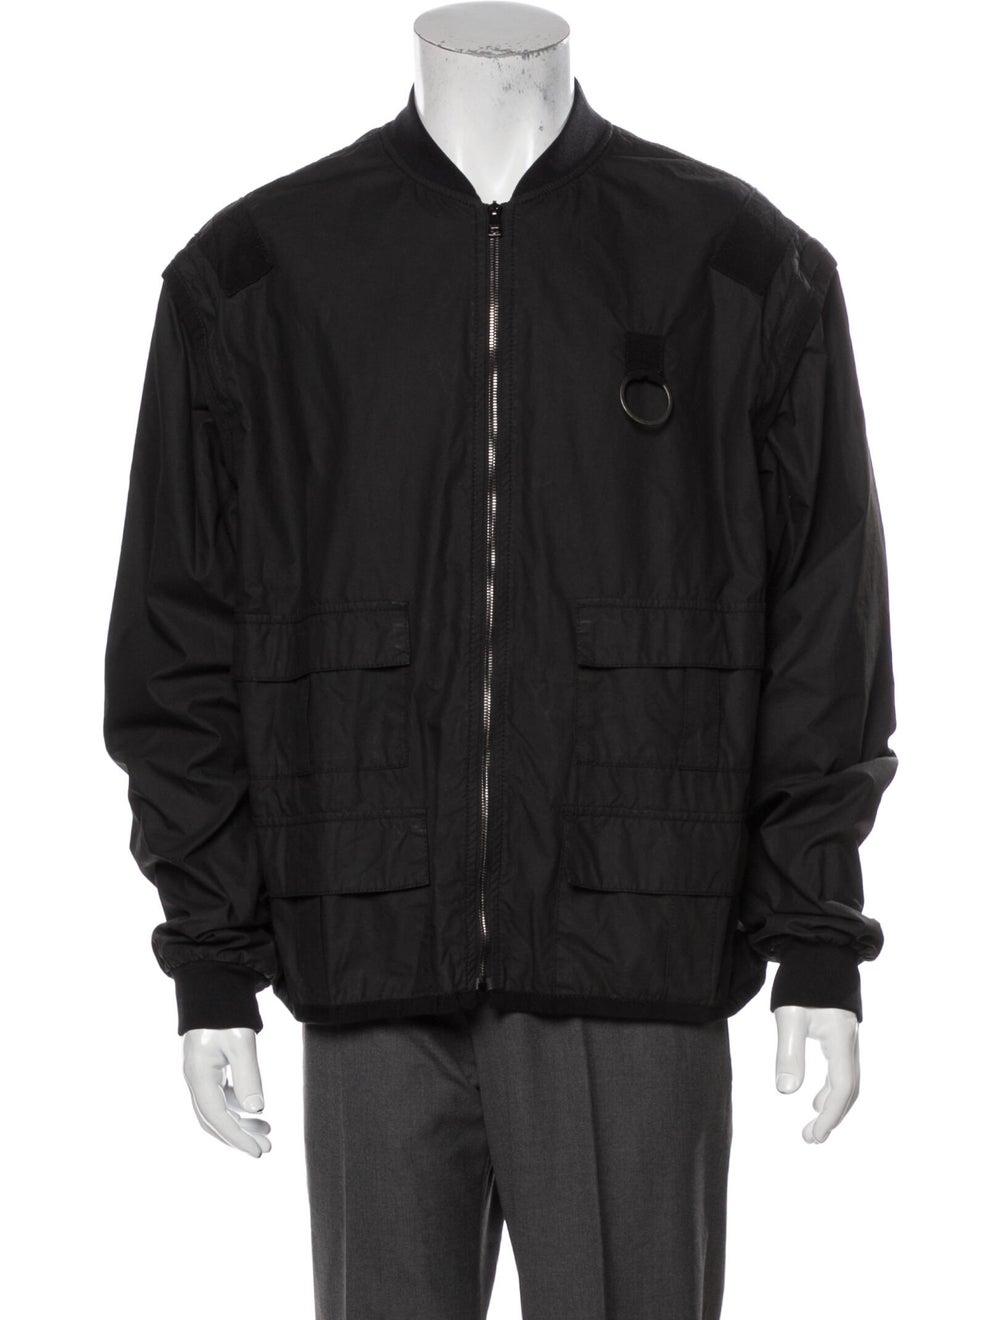 Gucci 2019 Bomber Jacket Black - image 1